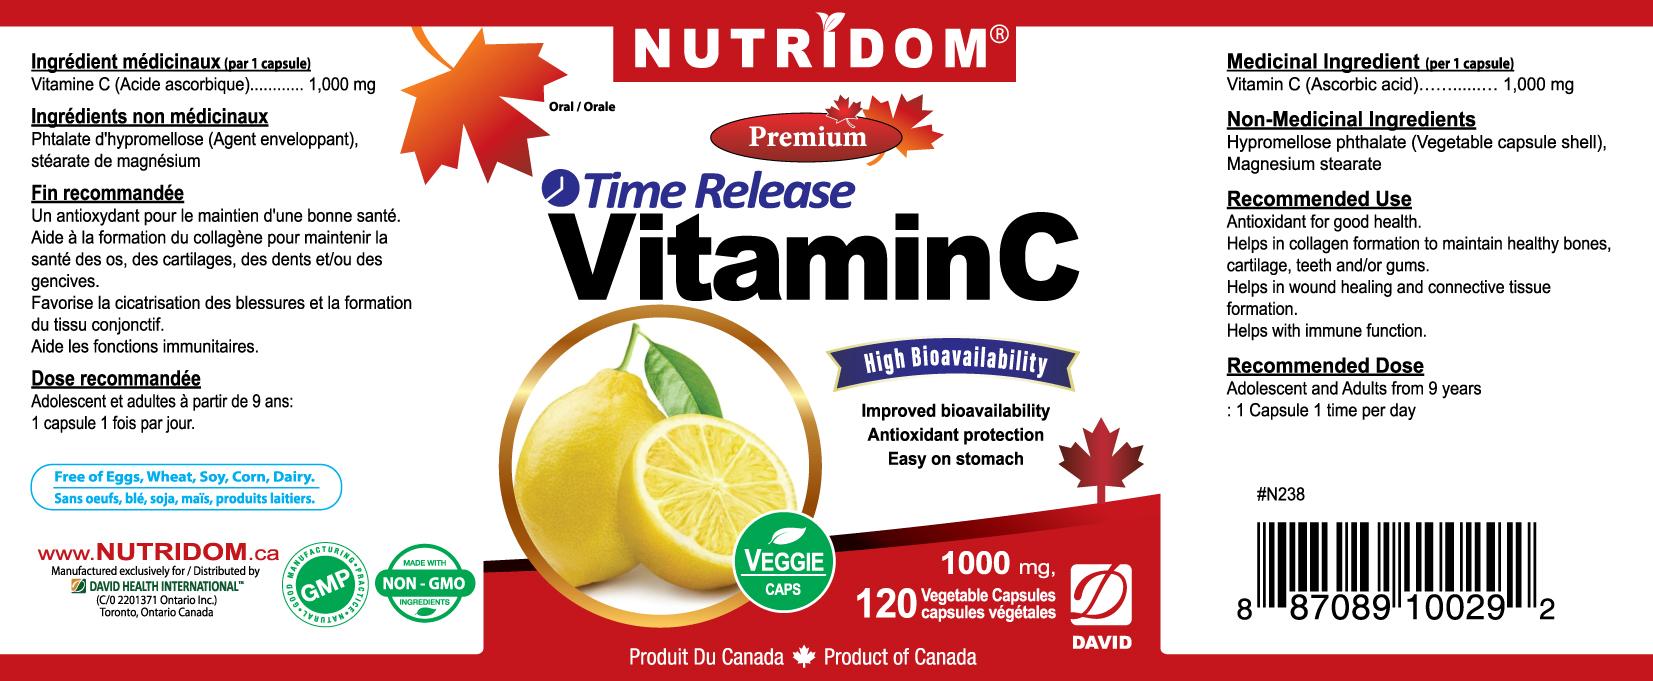 Nutridom Vitamin C 1000mg 120 Vcaps